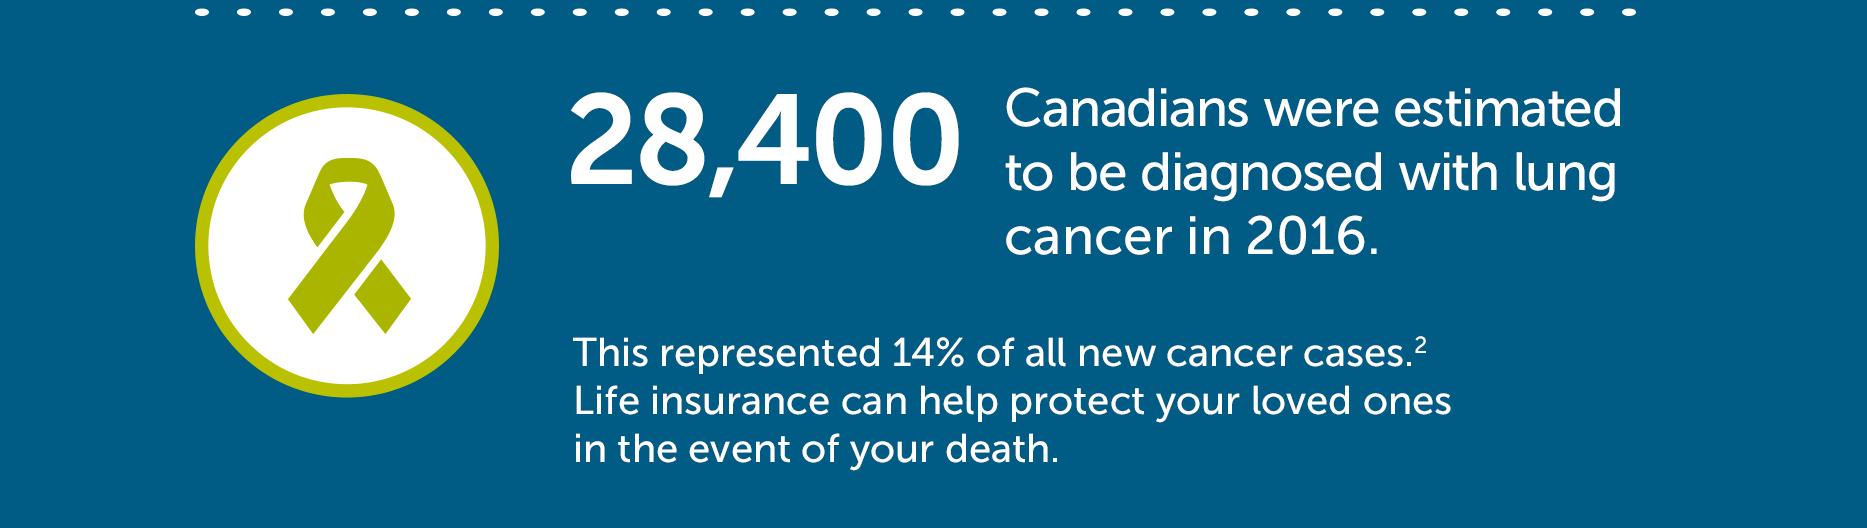 Cancer statistic